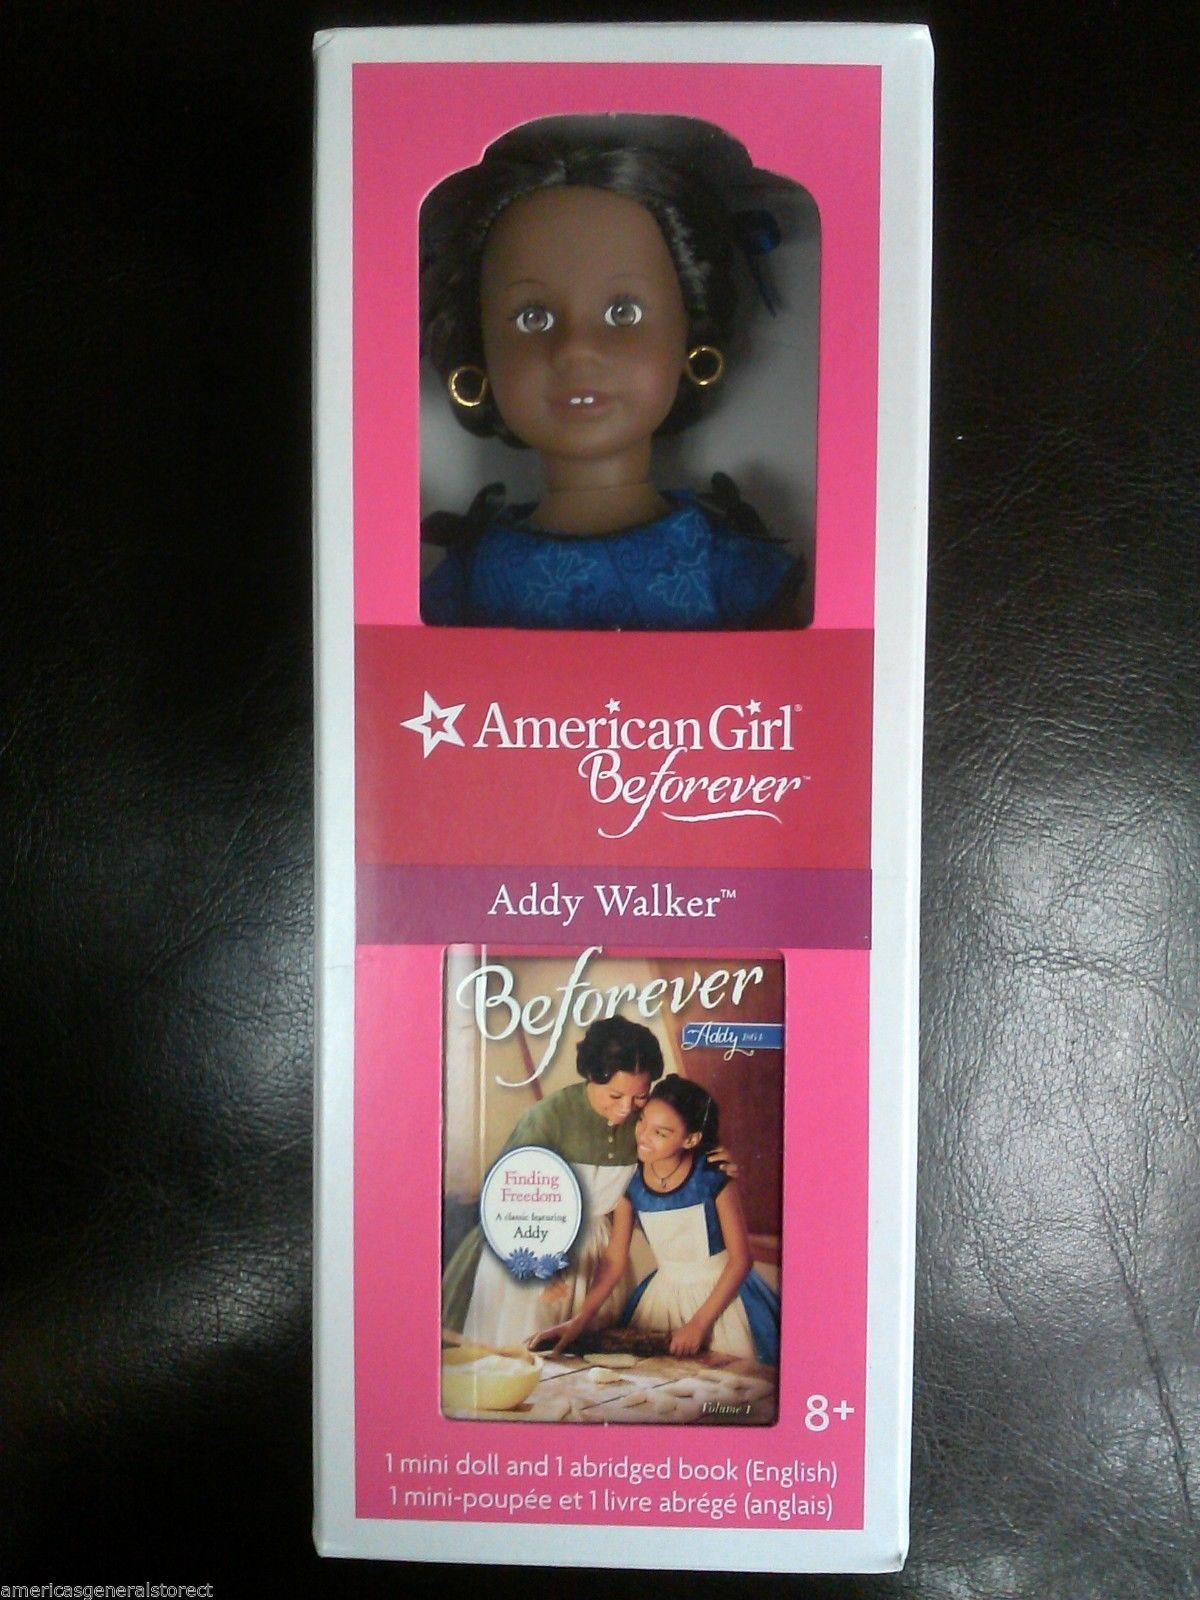 American girl beforever 6 mini doll 2014 addy walker mini